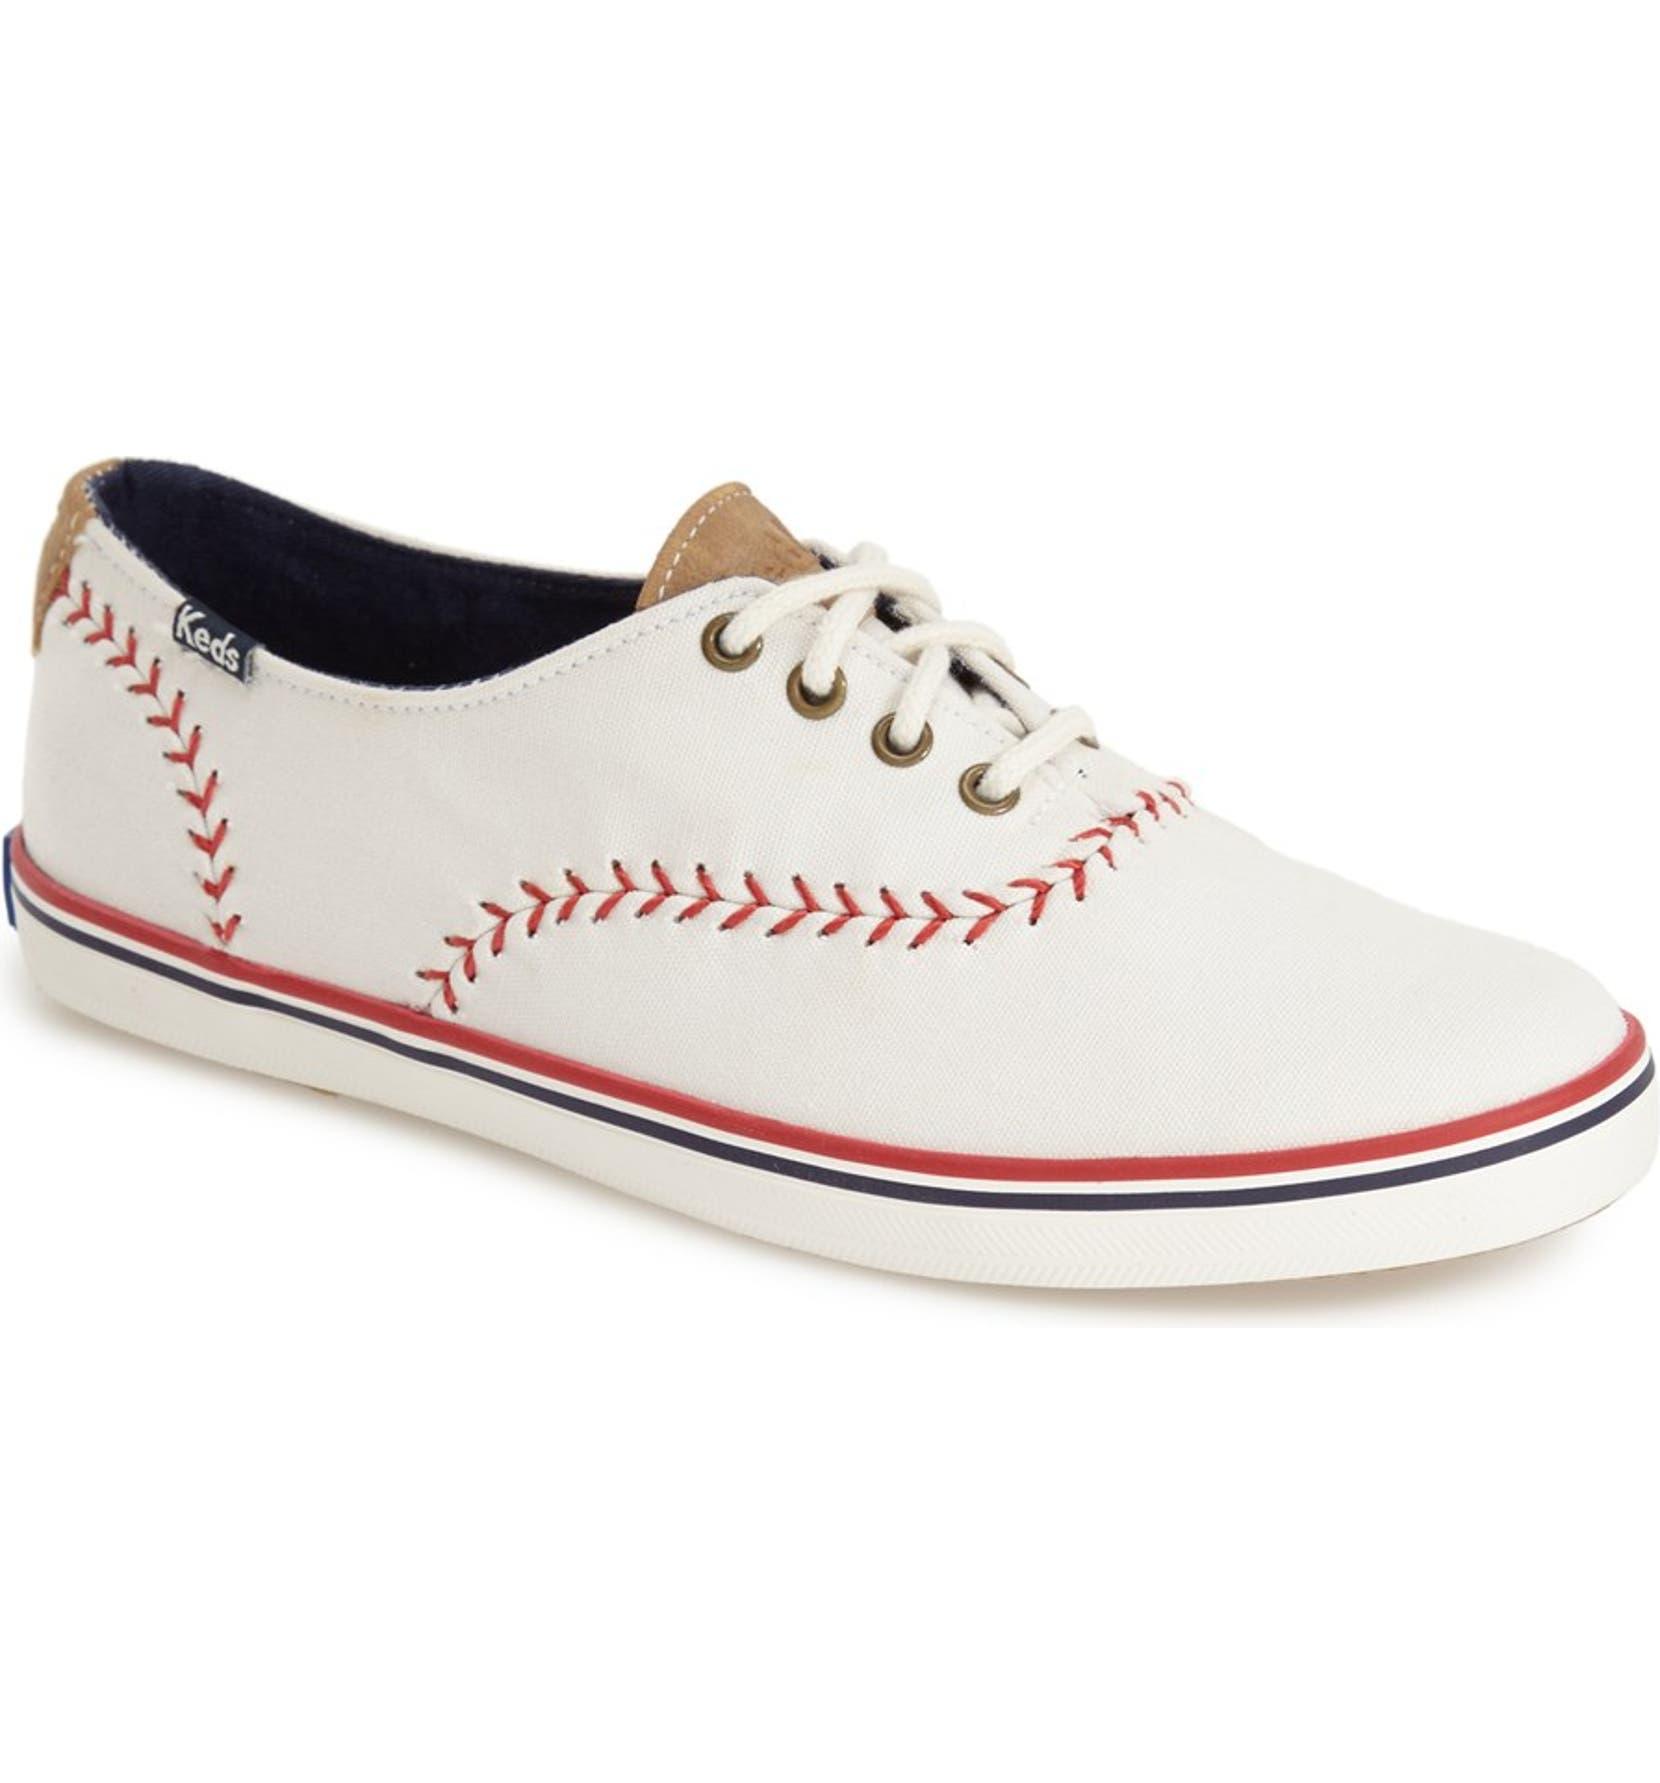 b3f3dc51417 Keds®  Champion - Pennant  Sneaker (Women)